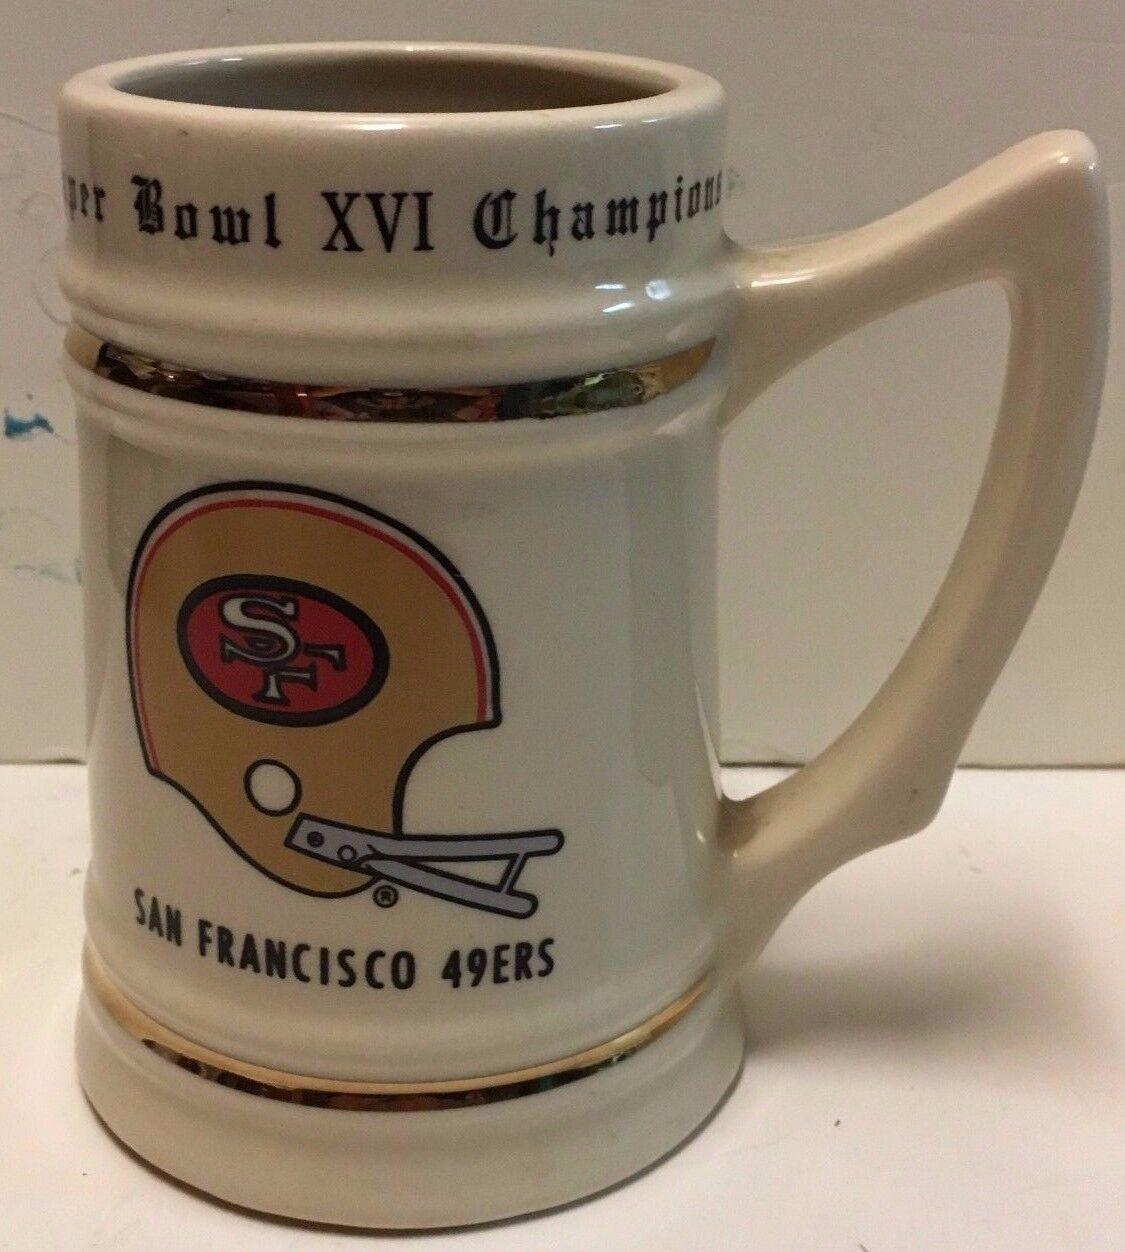 San Francisco 49ers Superbowl XVI Champions Stein Becher Krug NFL